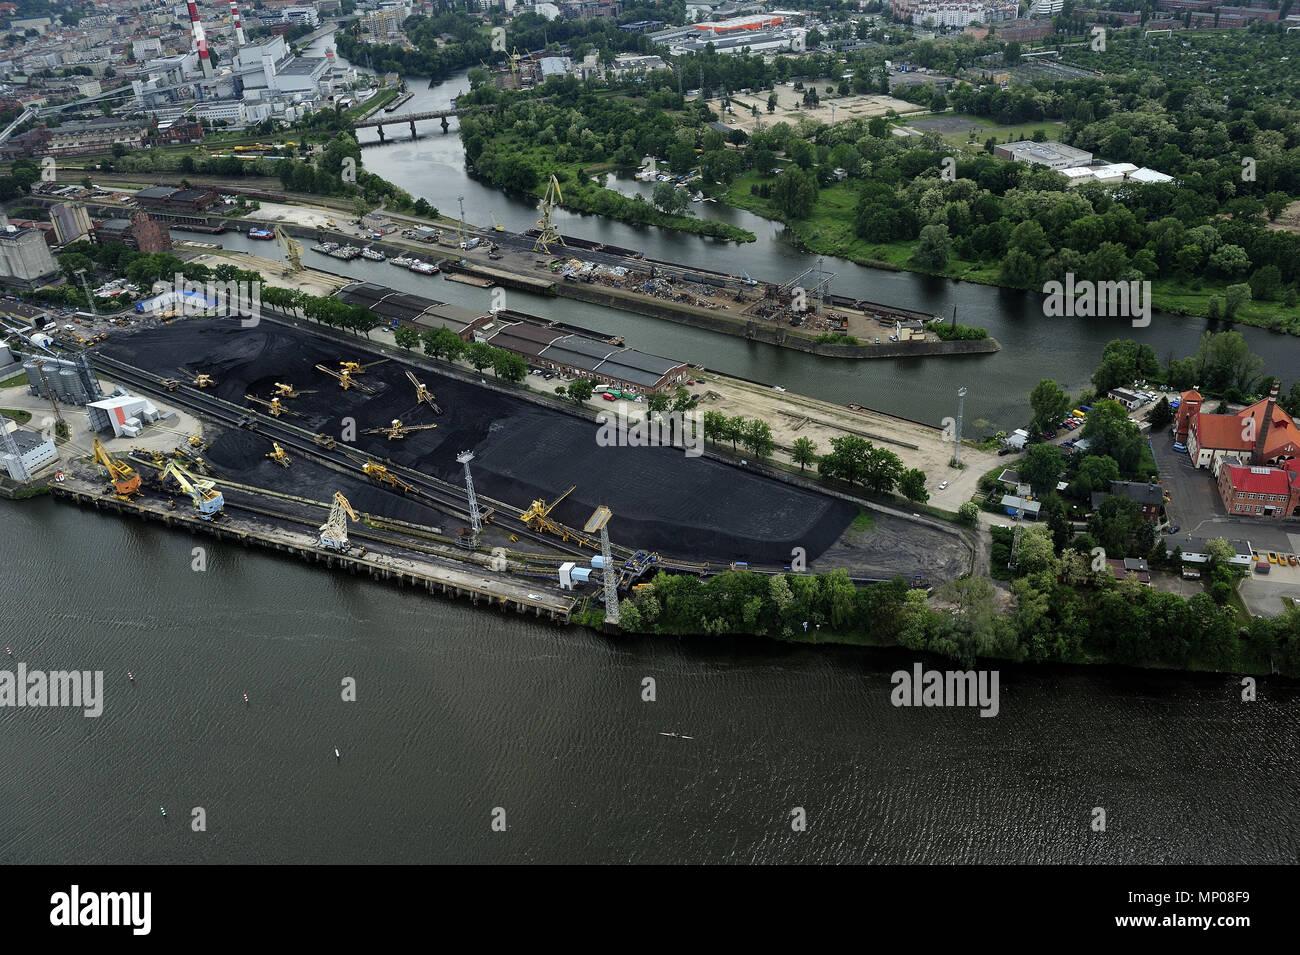 Wroclaw, aero, air, dolnoslaskie, architecture, Odra, river, old town, silesia, travel, poland, europe, landscape - Stock Image